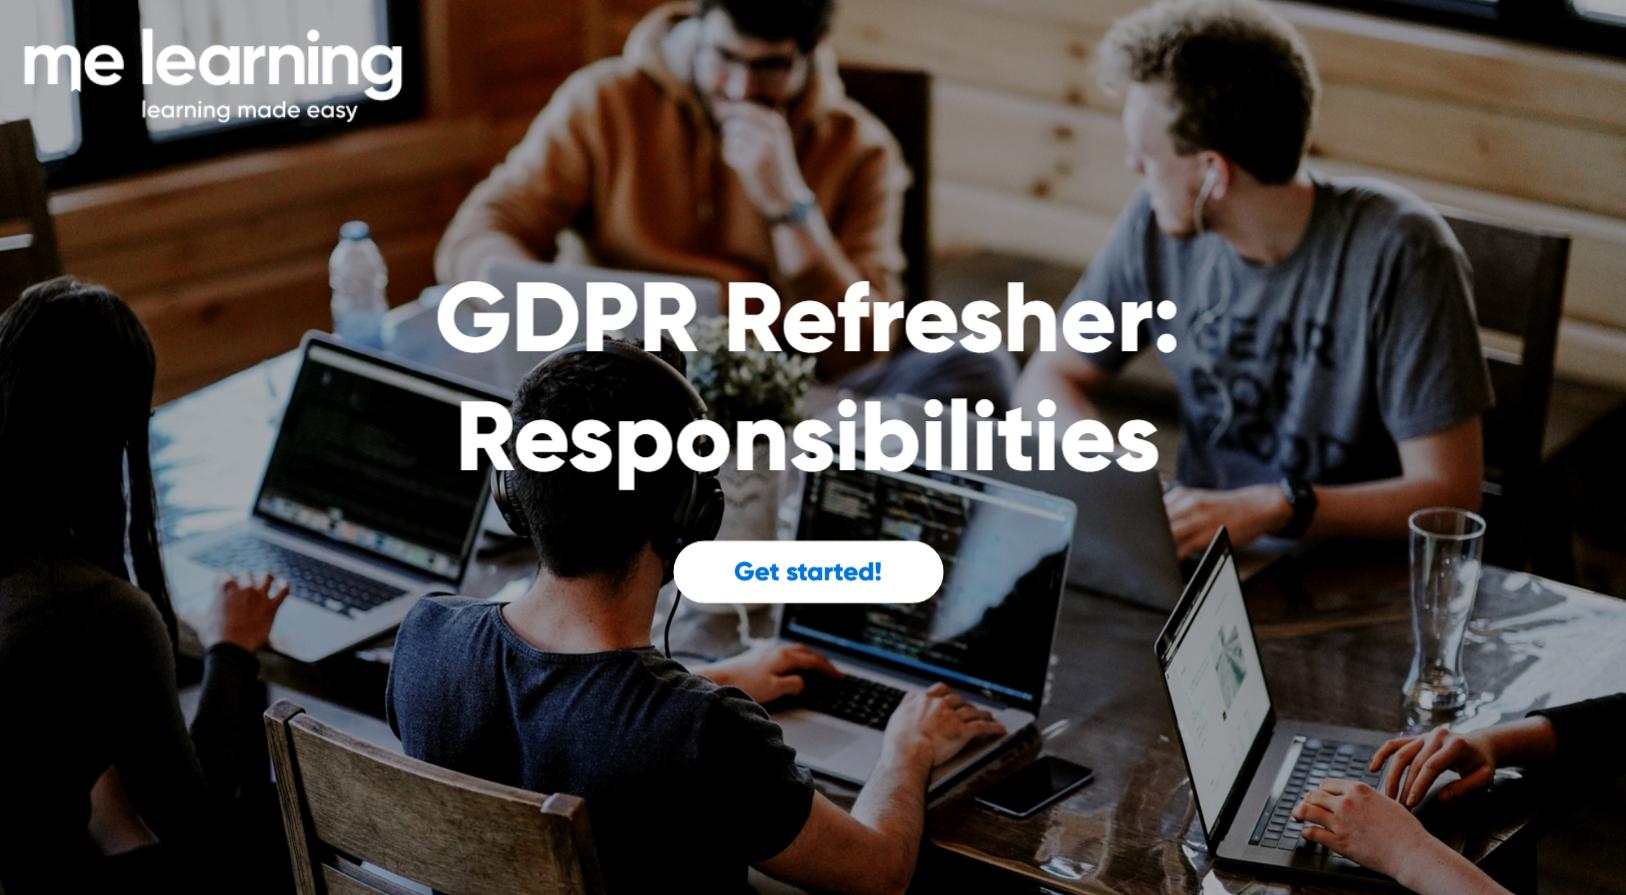 GDPR Refresher image